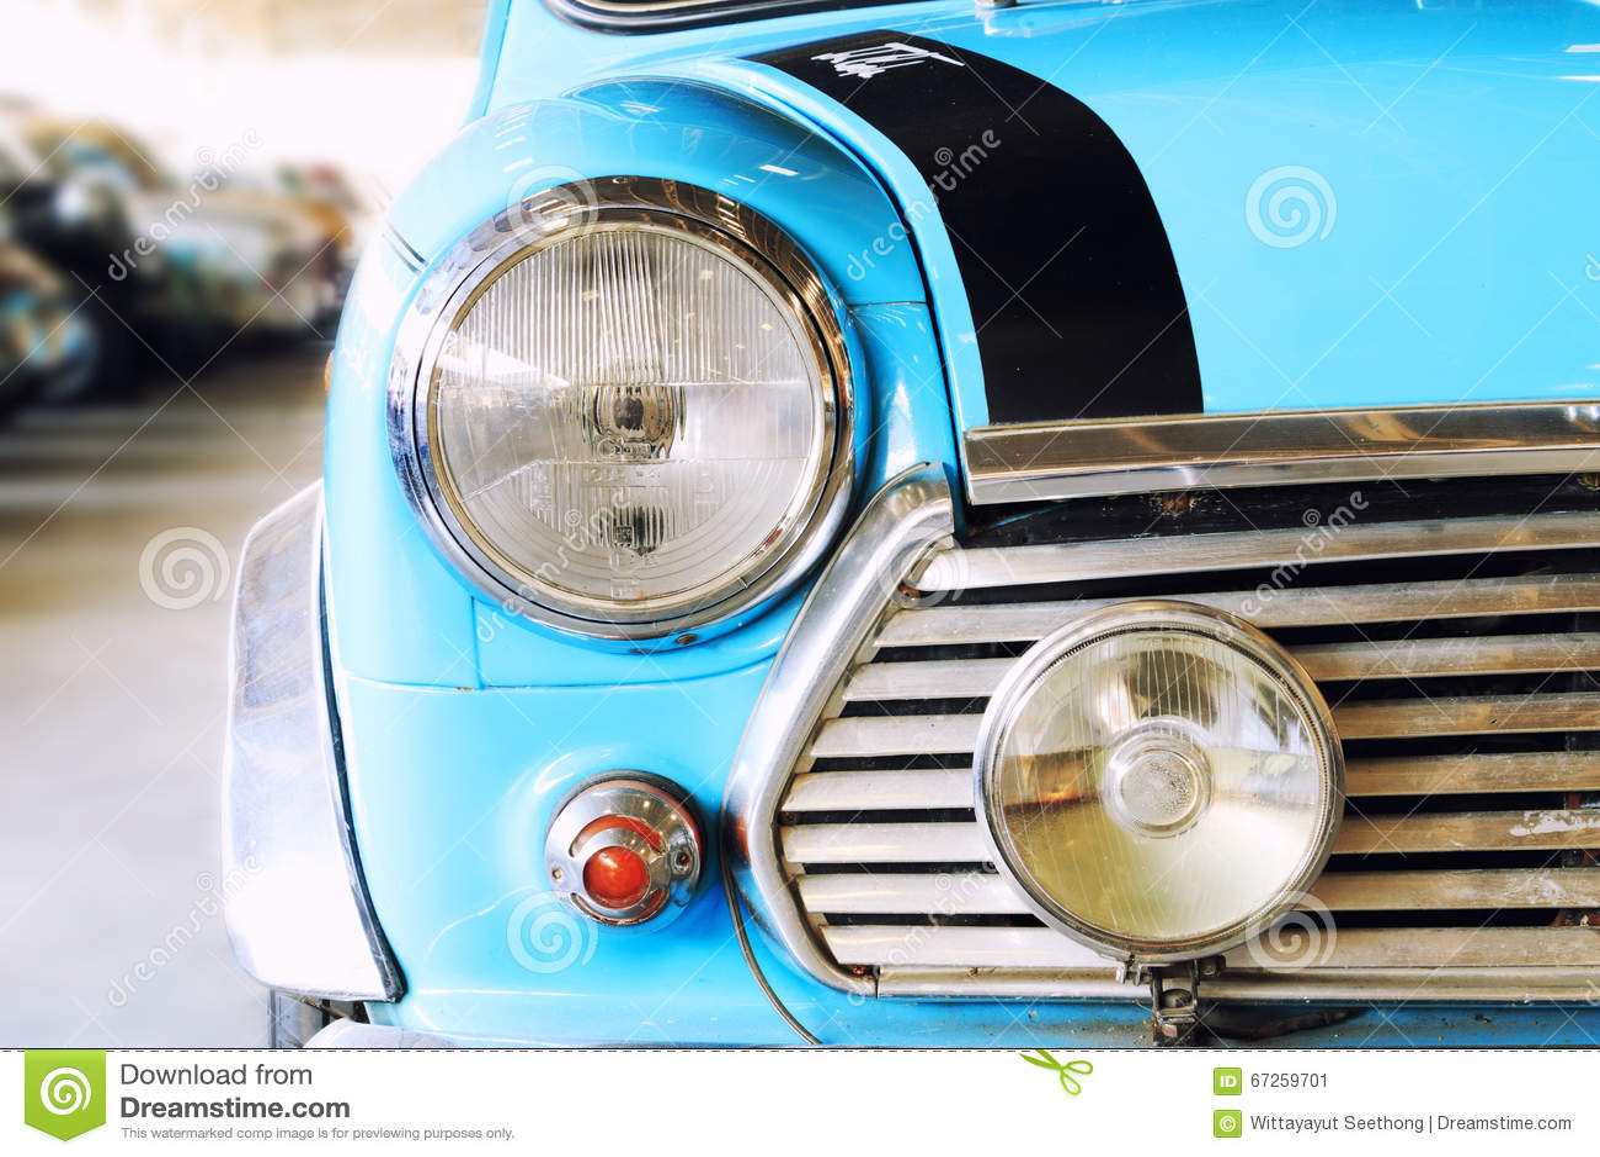 Vintage Auto Headlight Styles : Close up of headlight lamp blue vintage classic car stock